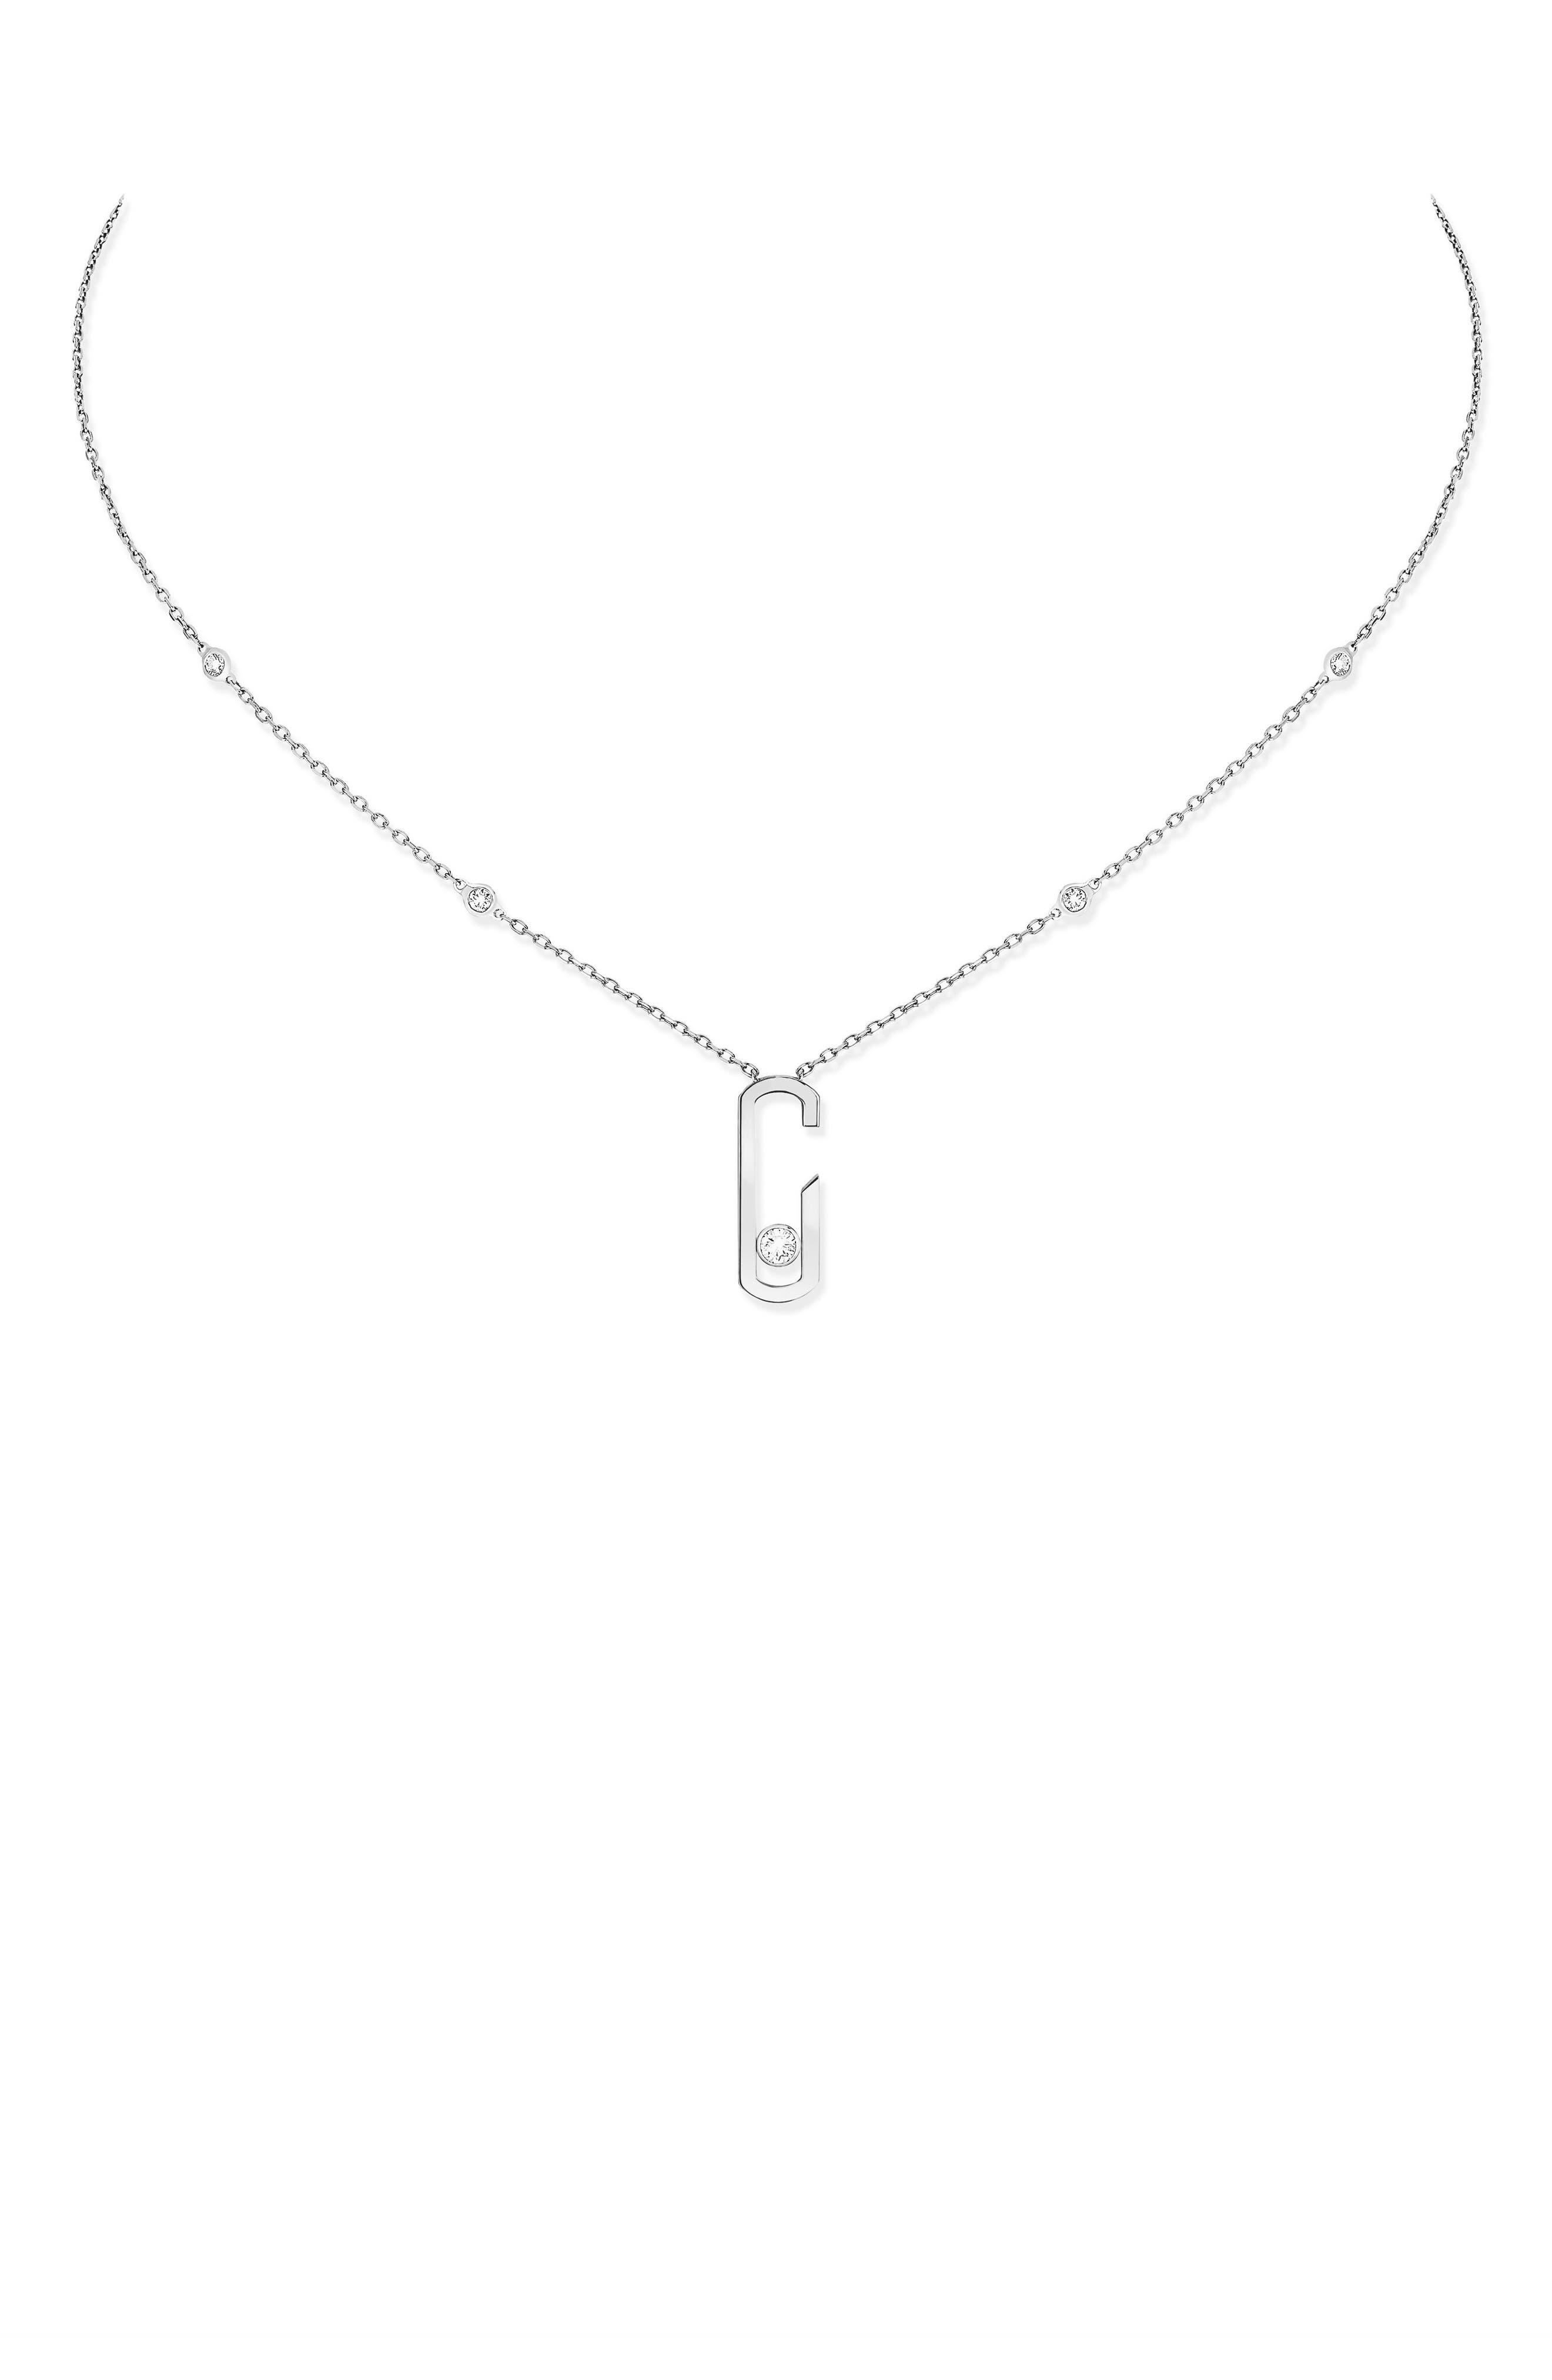 Move Addiction by Gigi Hadid Diamond Station Pendant Necklace,                             Main thumbnail 1, color,                             WHITE GOLD